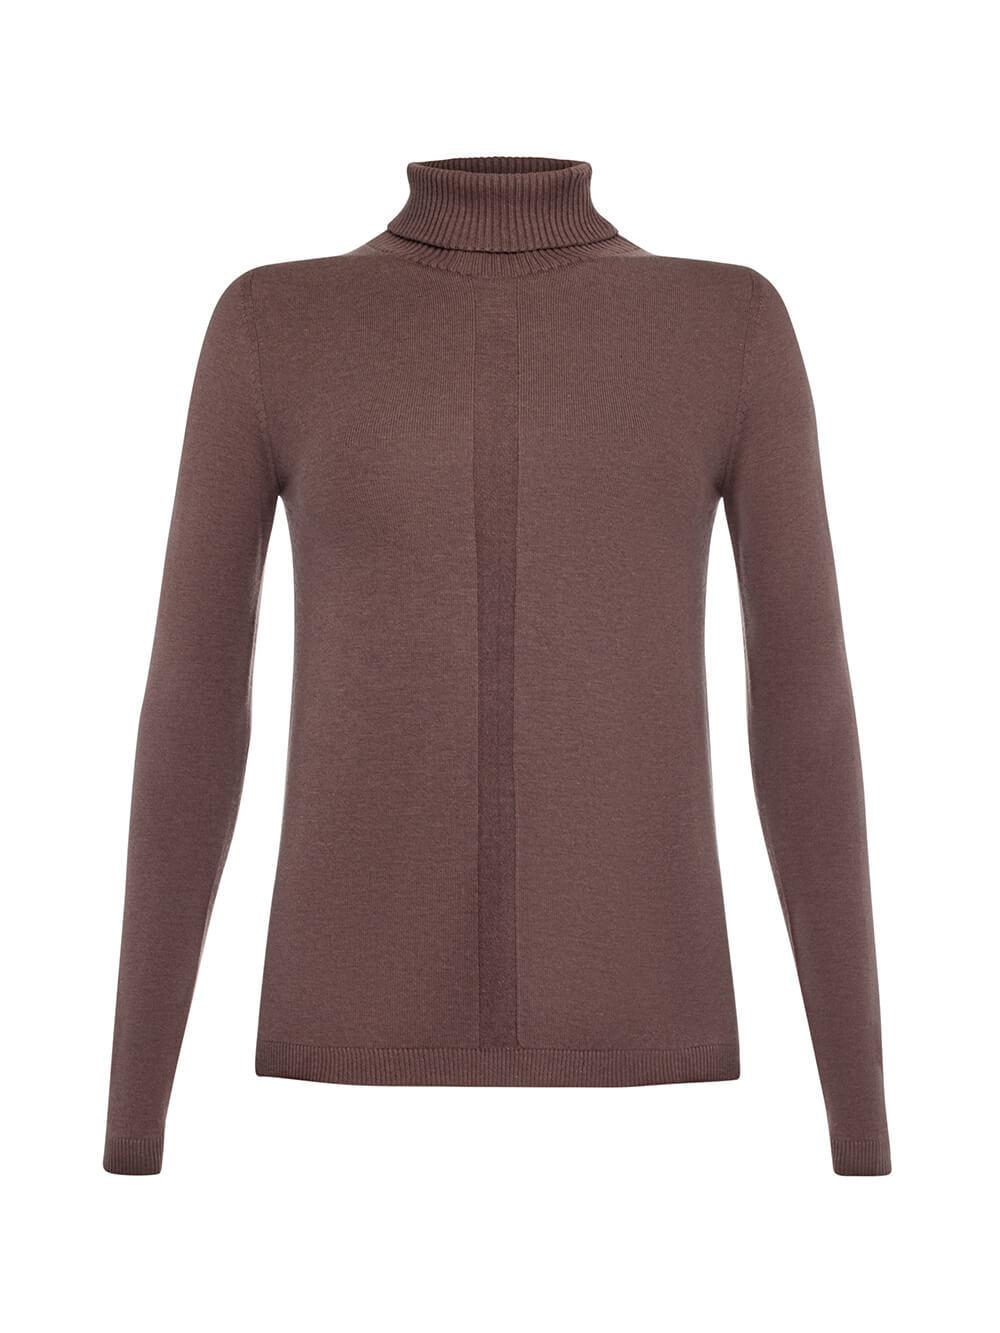 Женский джемпер коричневого цвета из шерсти и шелка - фото 1